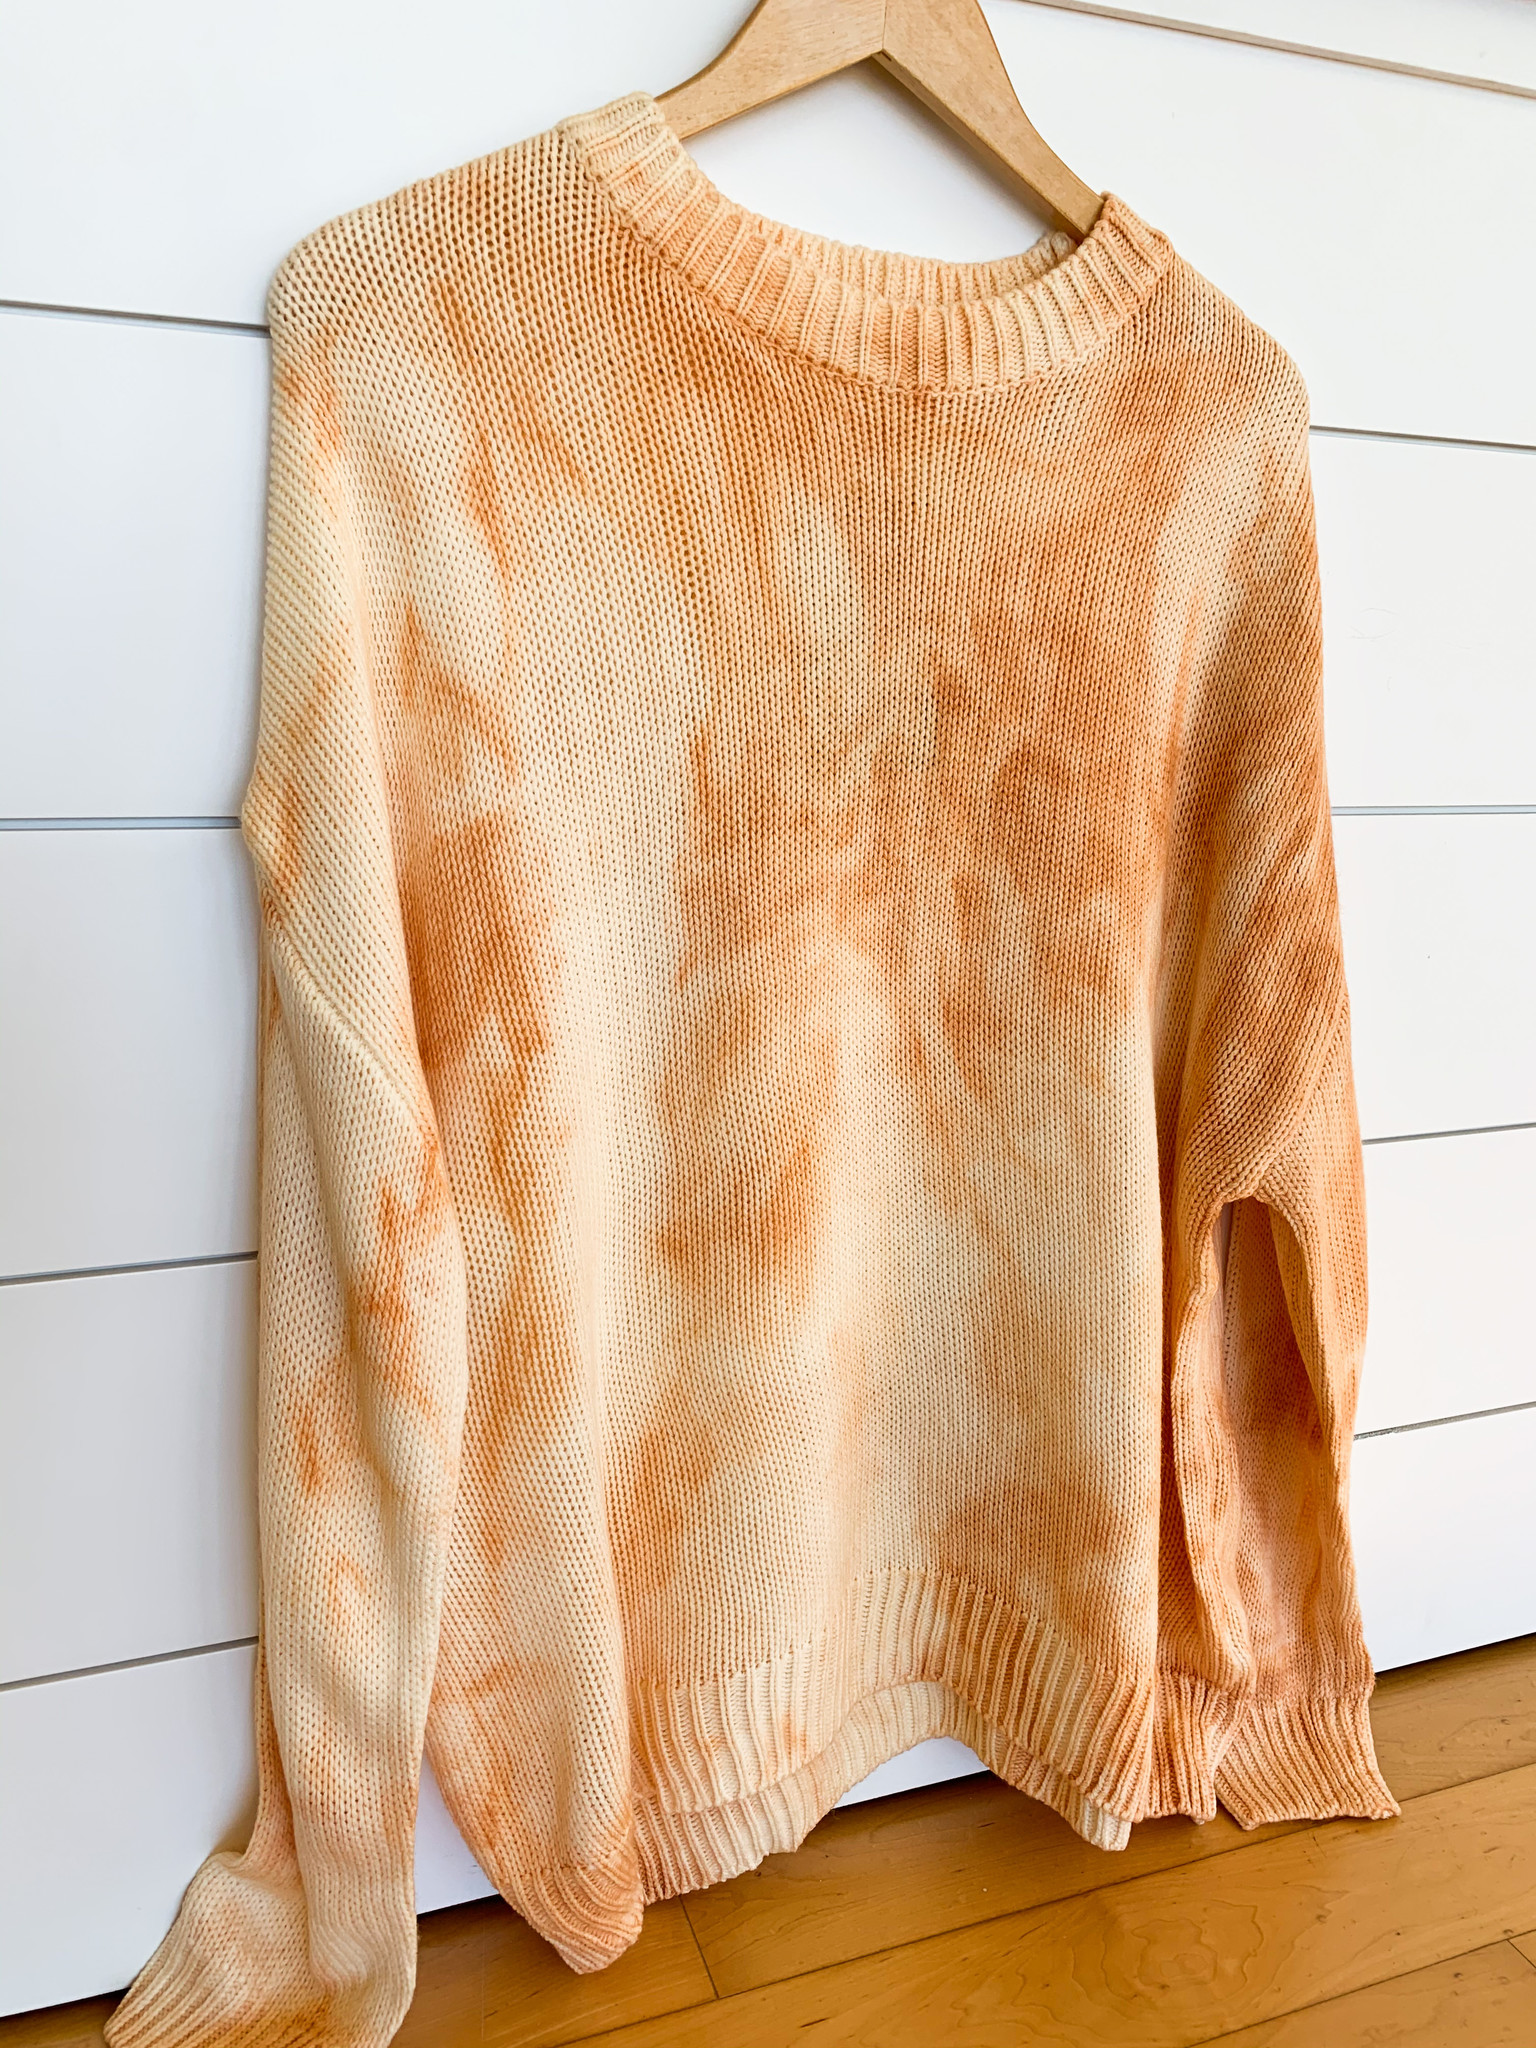 Main Strip Apparel Apricot Oversize Tie Dye Sweater